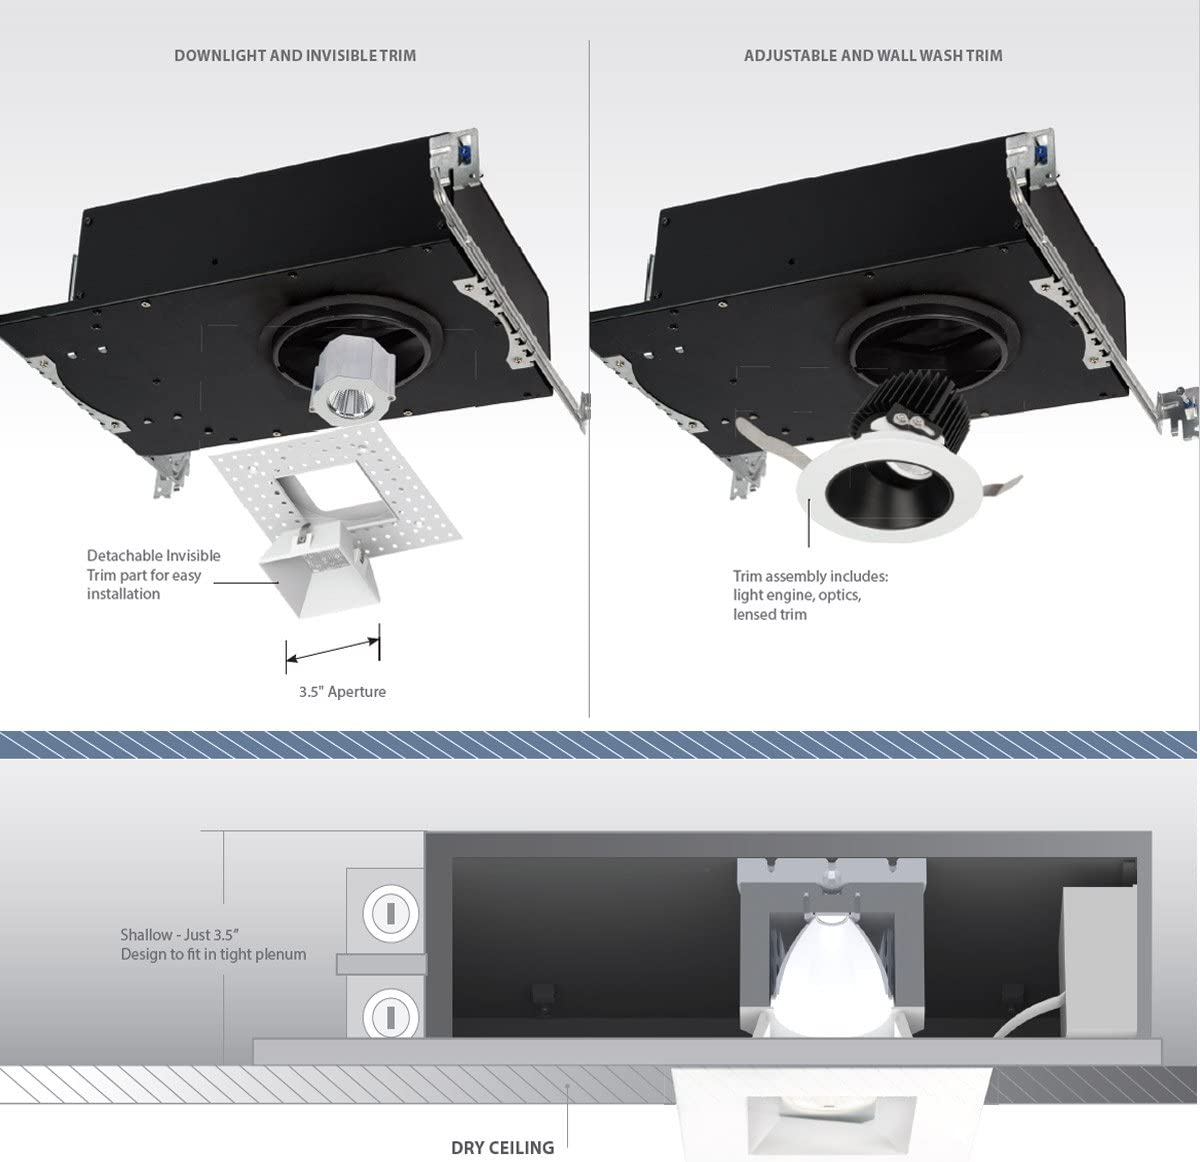 WAC Lighting R3ASAT-N927-BKWT Aether Square Adjustable Trim with LED Light Engine Narrow 25 Beam 2700K Warm 90CRI Black White